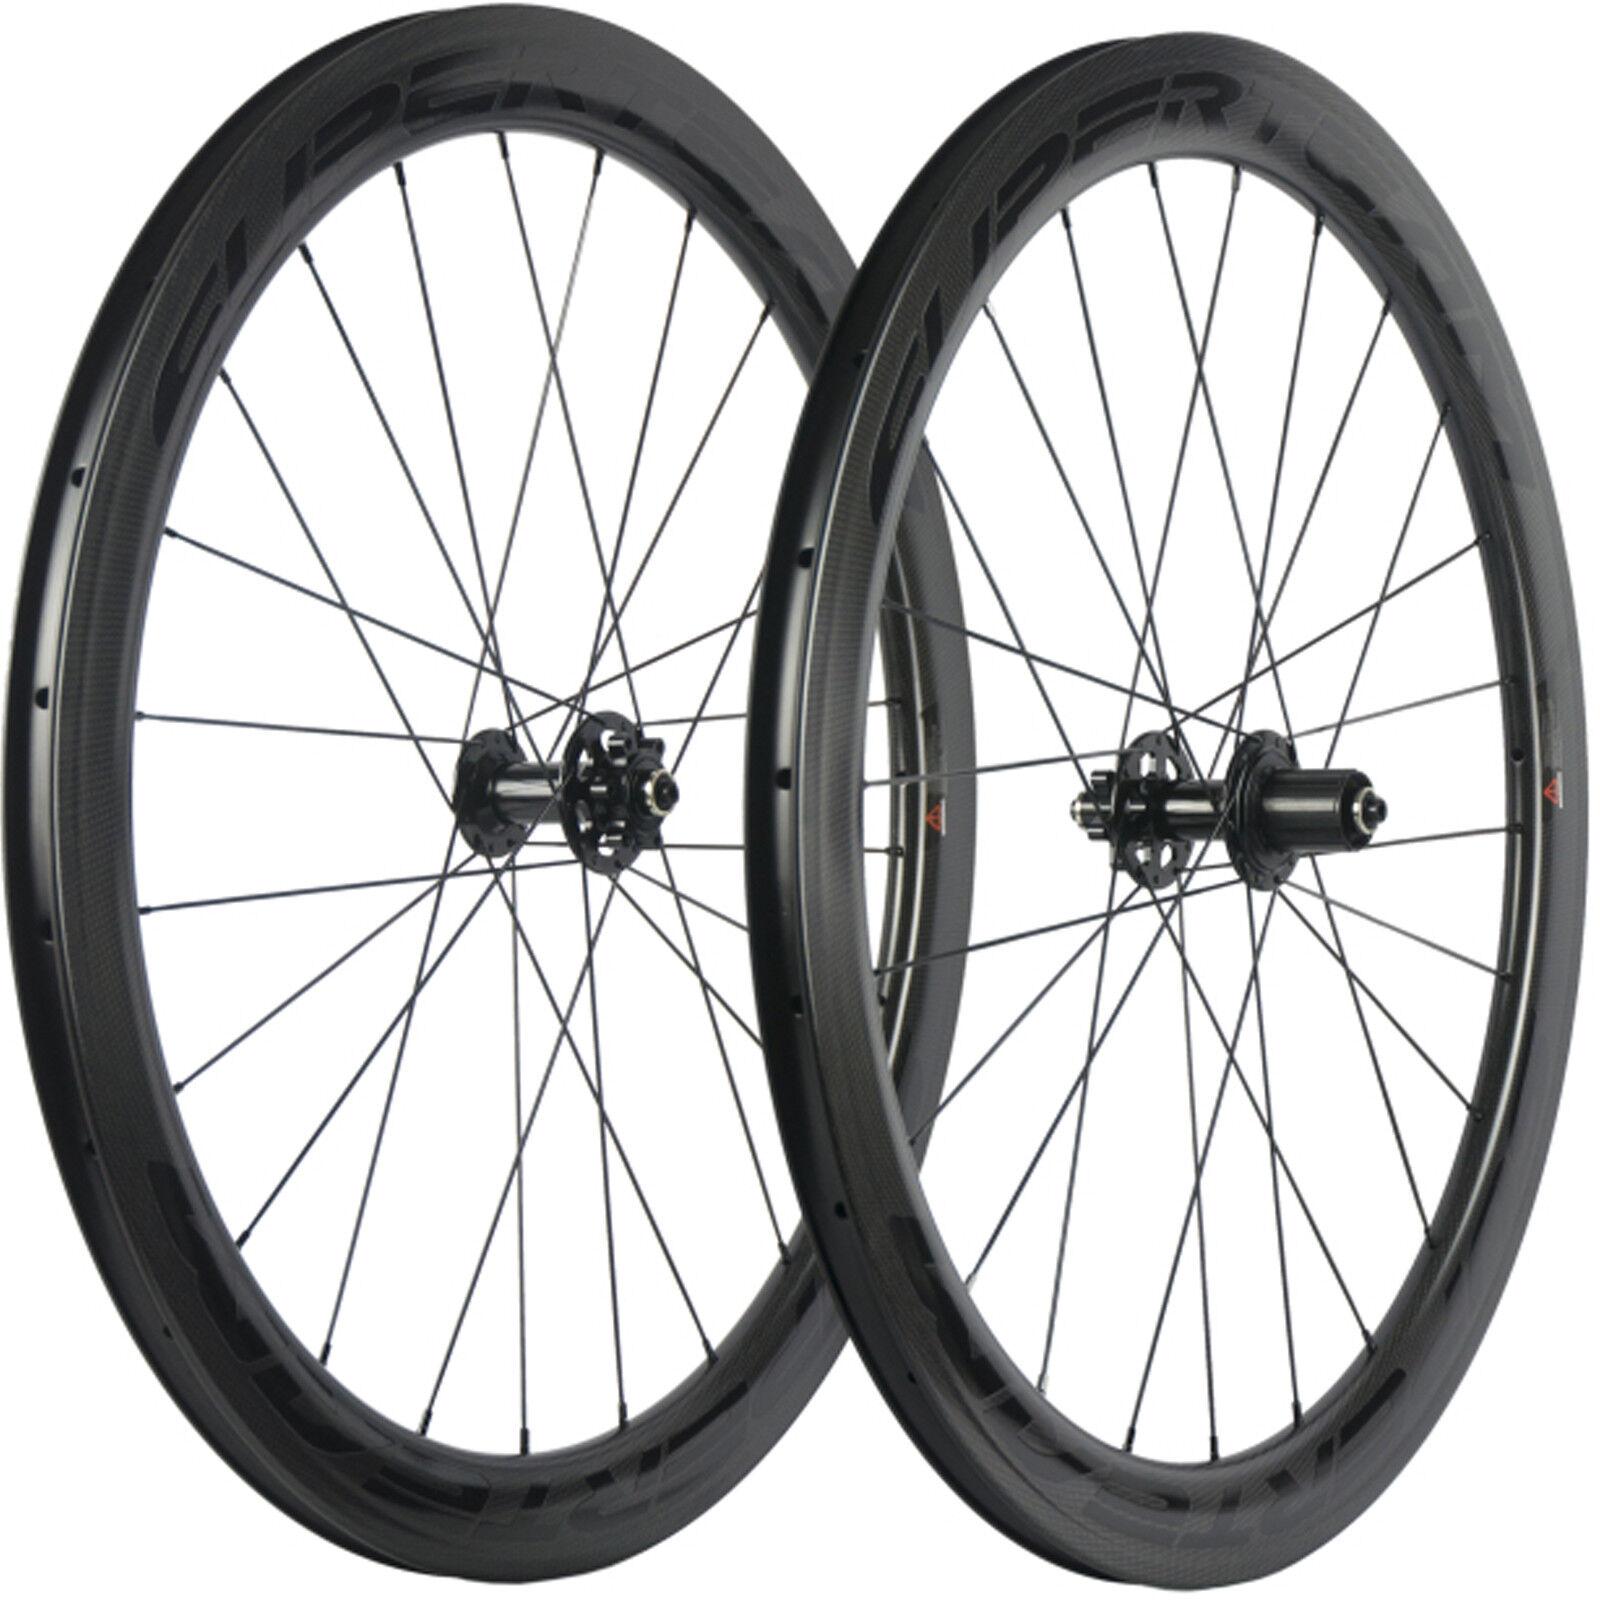 SUPERTEAM Road Bike Disc Brake Carbon Wheelset 6 Bolt 50mmClincher Carbon Wheels